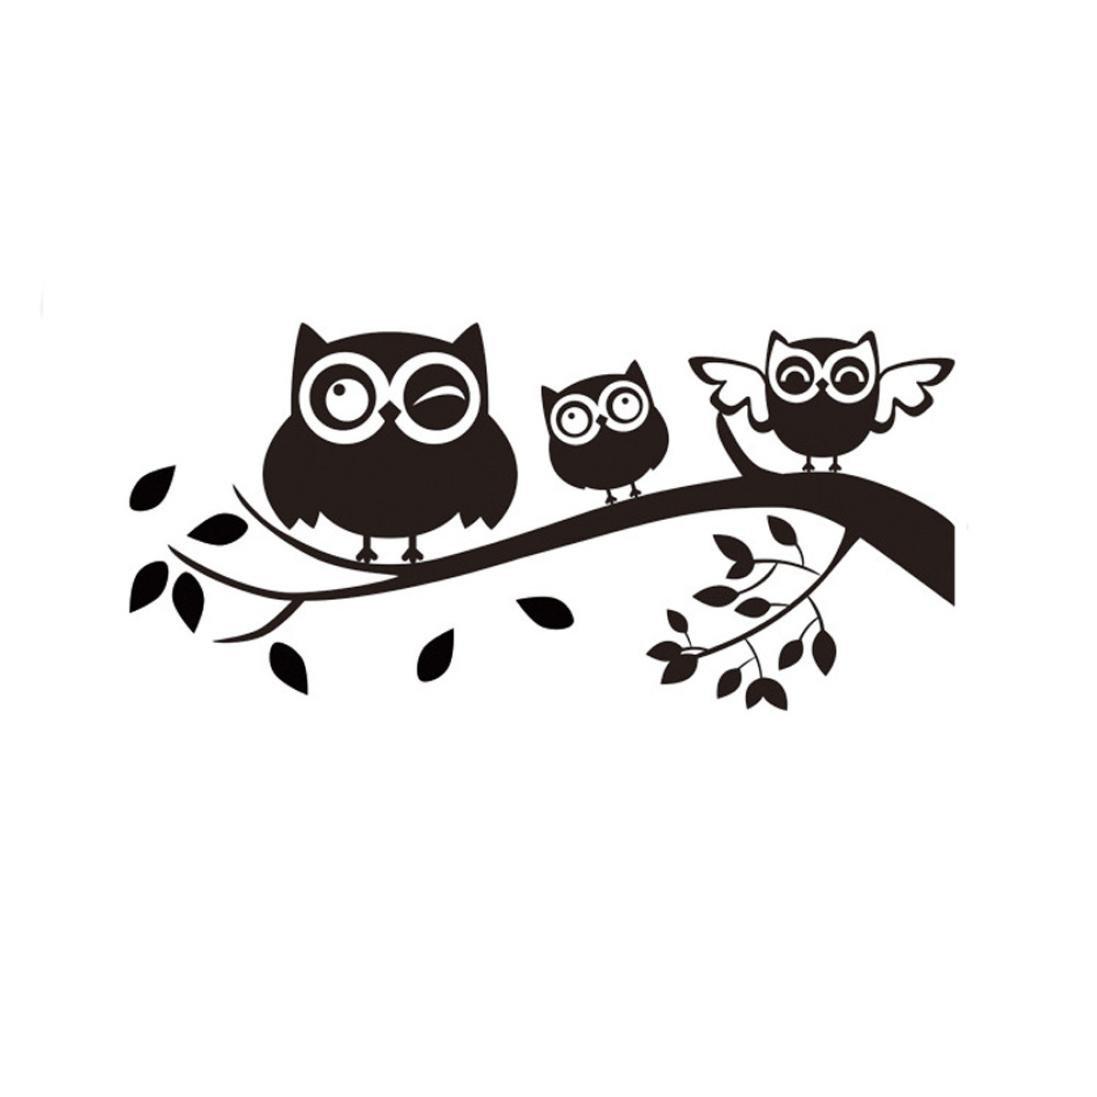 Amazon com smdoxi wall stickers kawaii owls removable 3d wall paper bathroom door cartoon mural decals vinyl art room decor black home kitchen